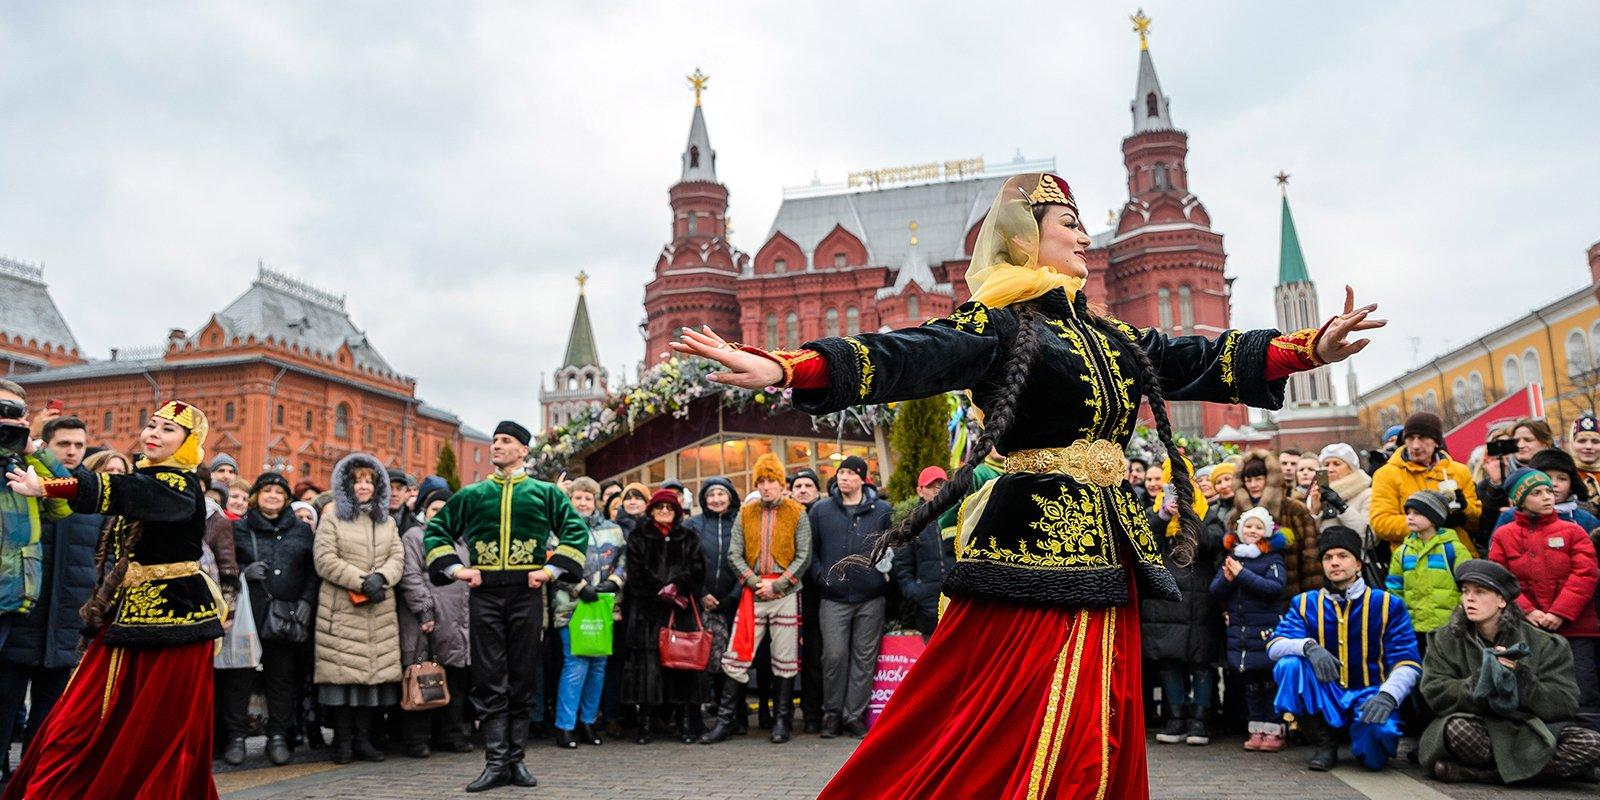 Туризм: 5 фестивалей марта